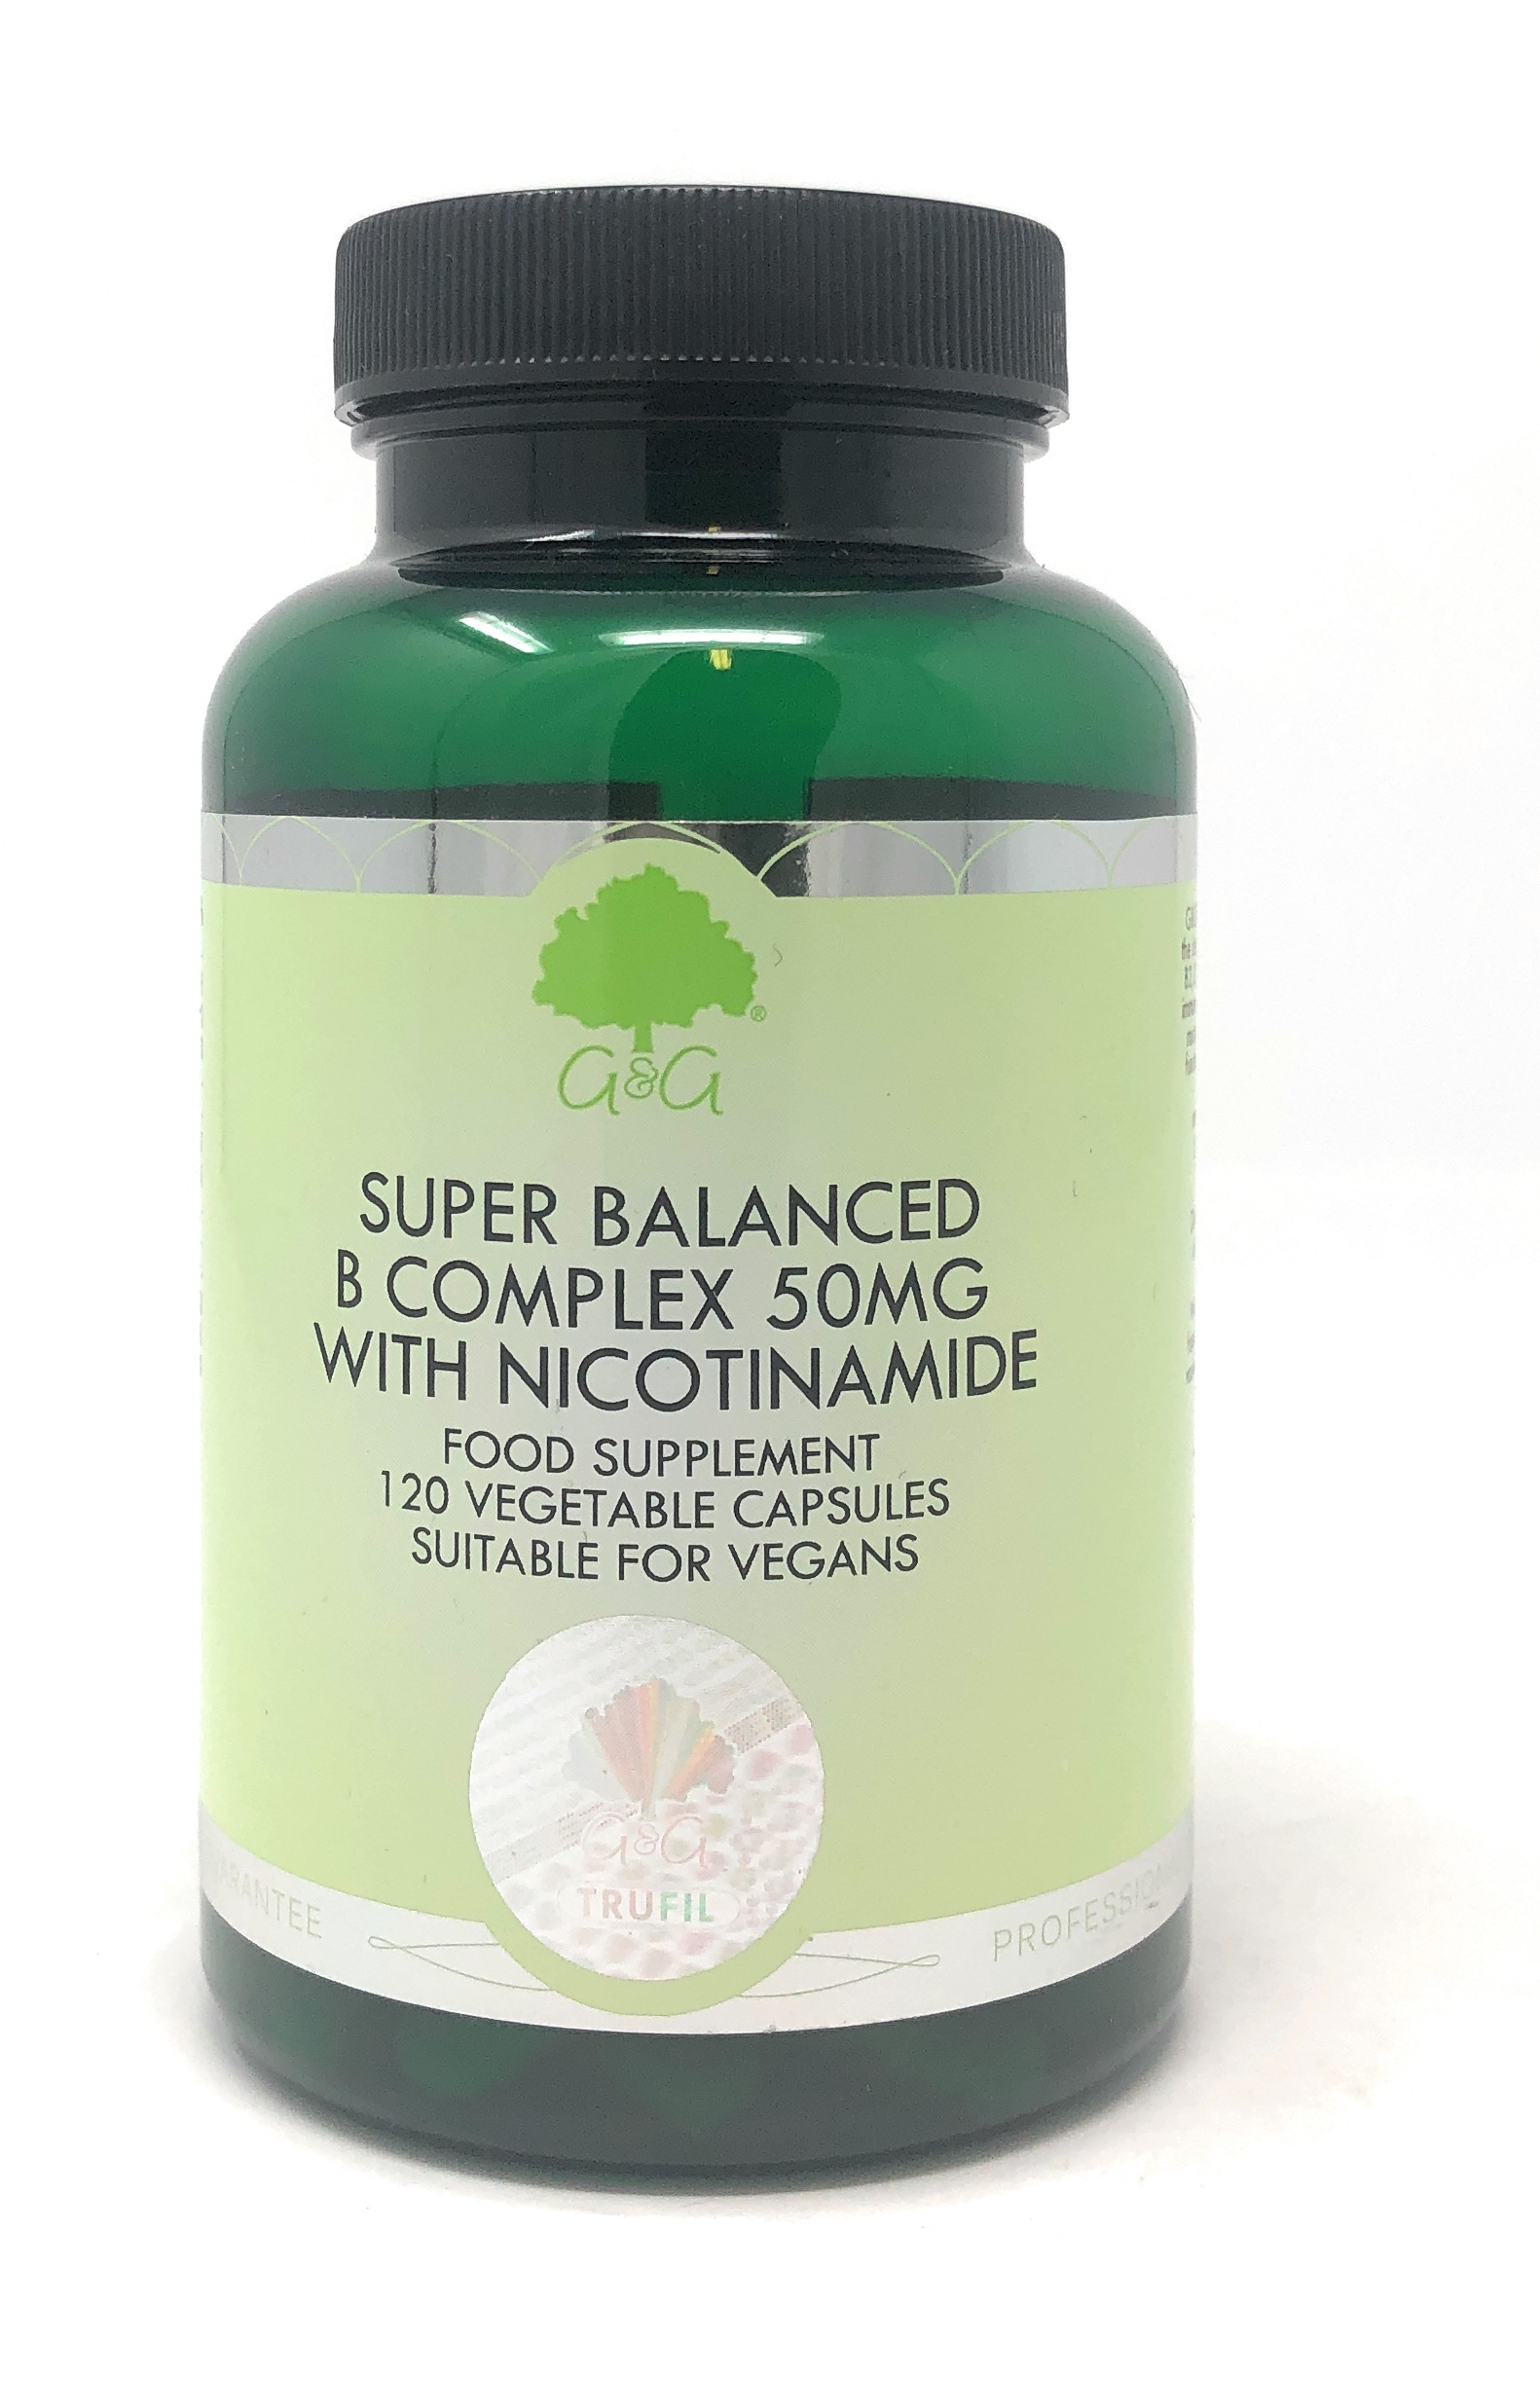 G&G Vitamins Super Balanced B Complex 50mg with Nicotinamide 120 veg. Kapseln (56,8g) (vegan)